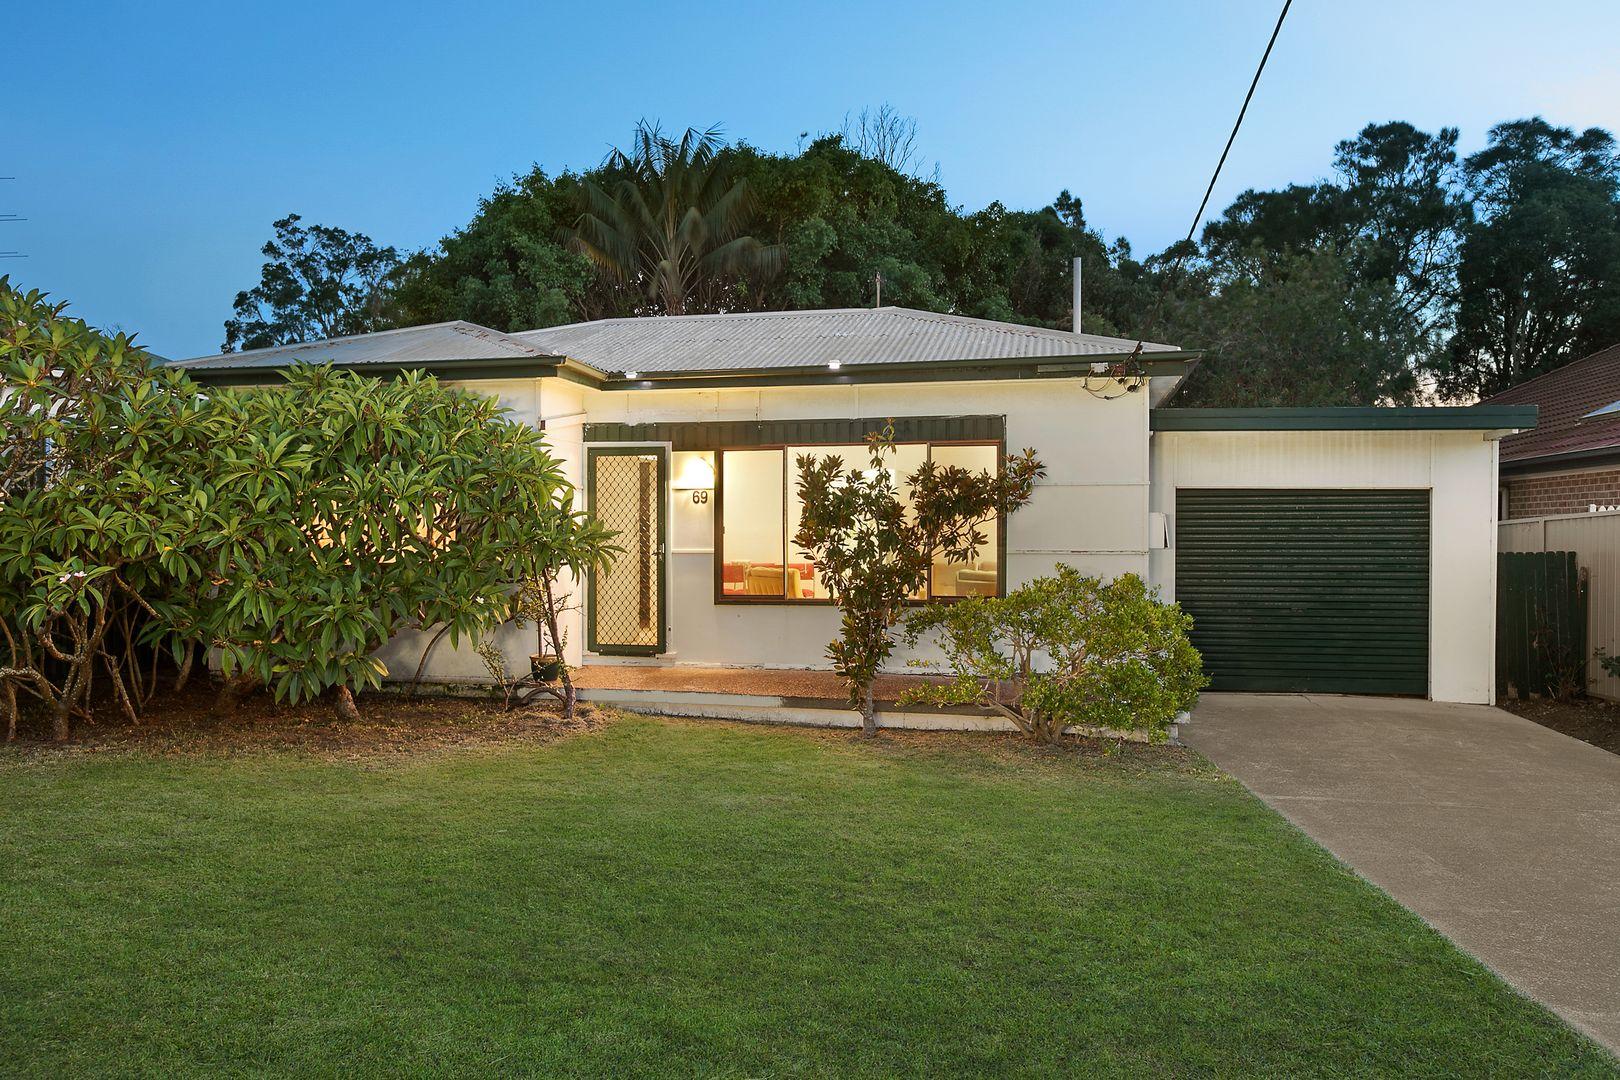 69 Swadling Street, Long Jetty NSW 2261, Image 0